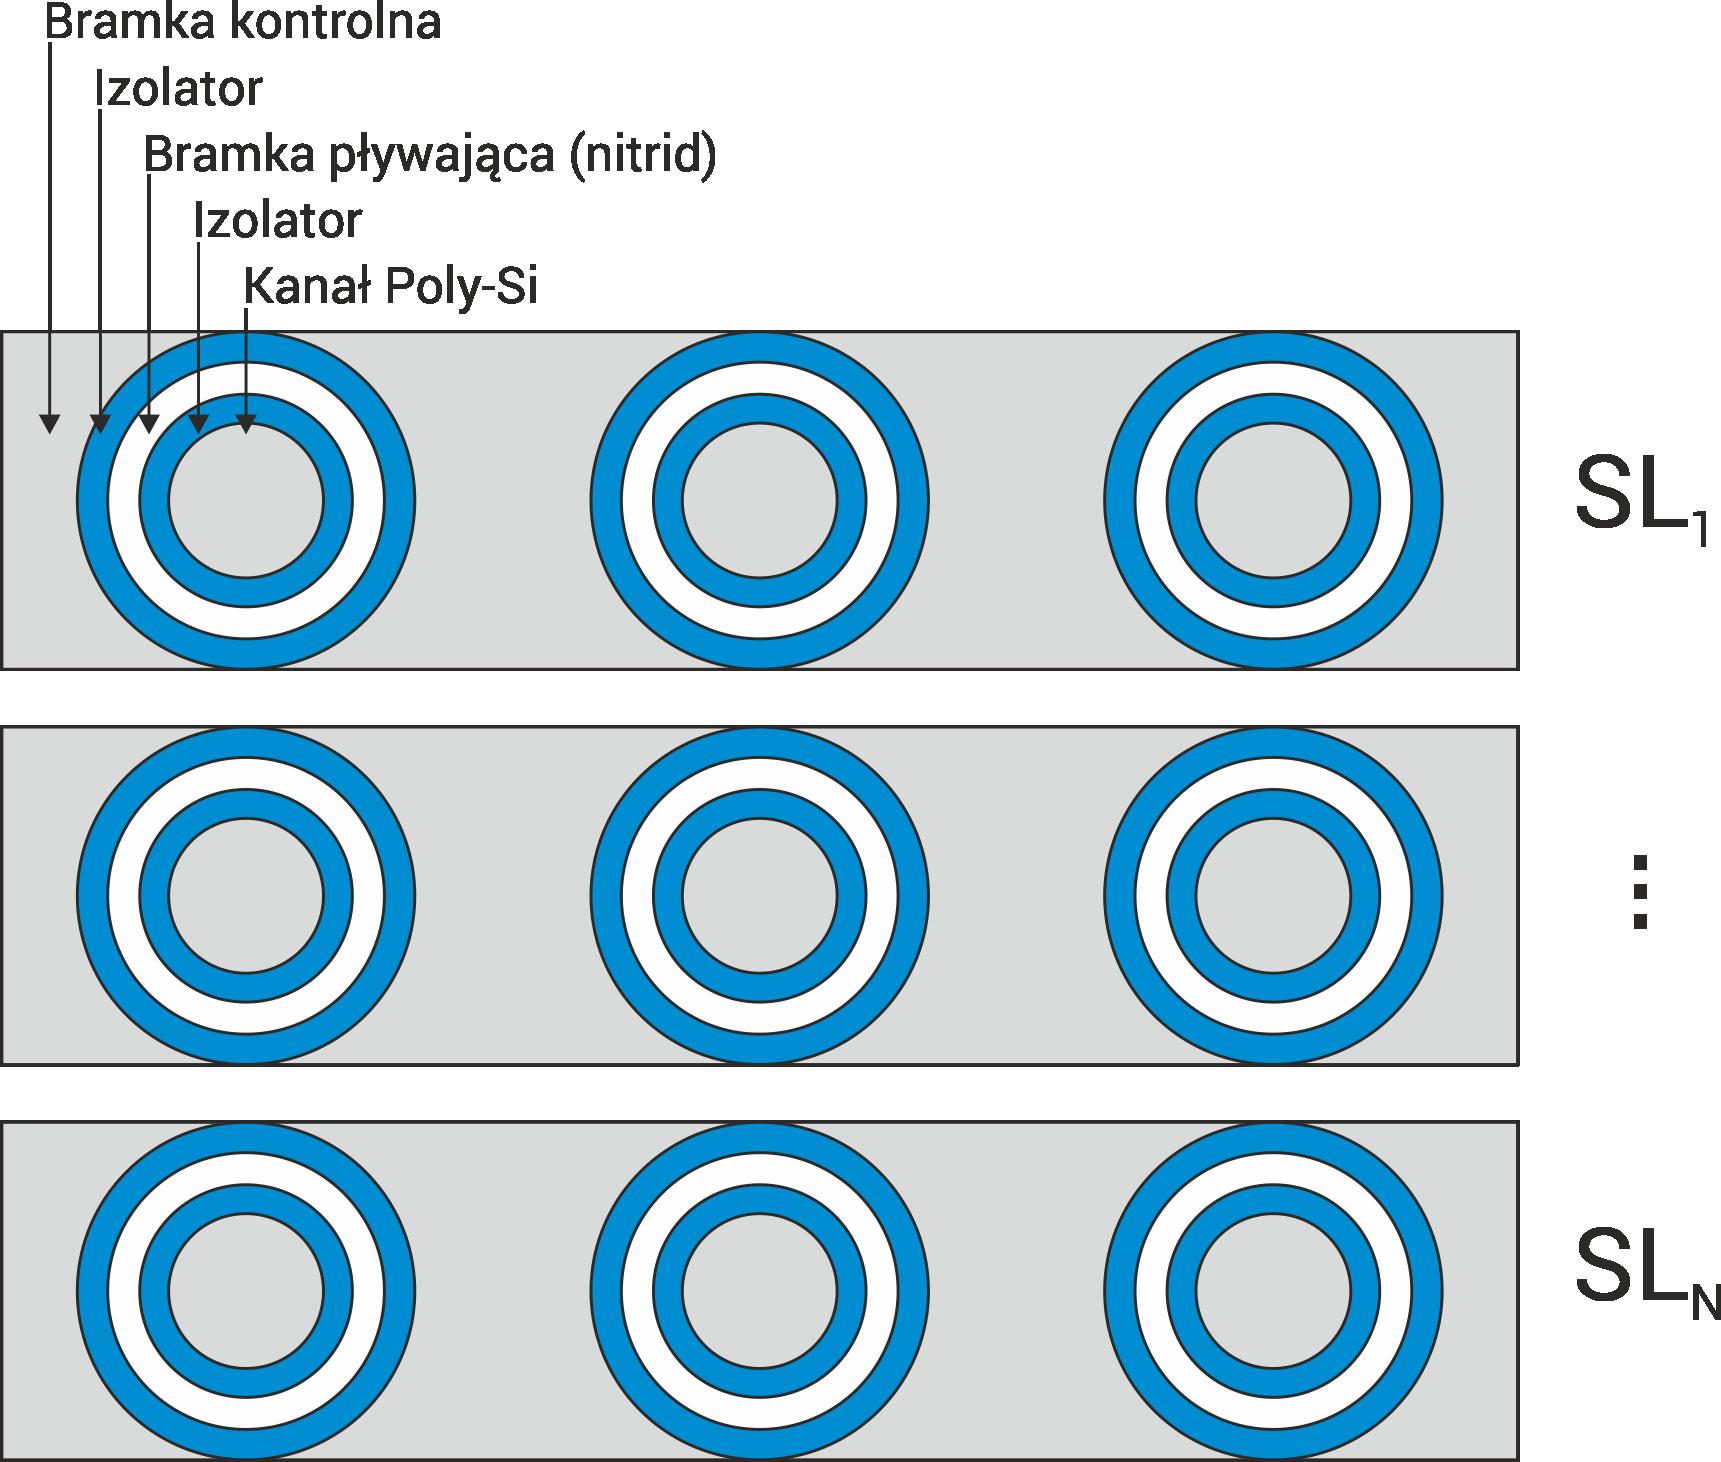 Horyzontalny widok komórek pamięci 3D